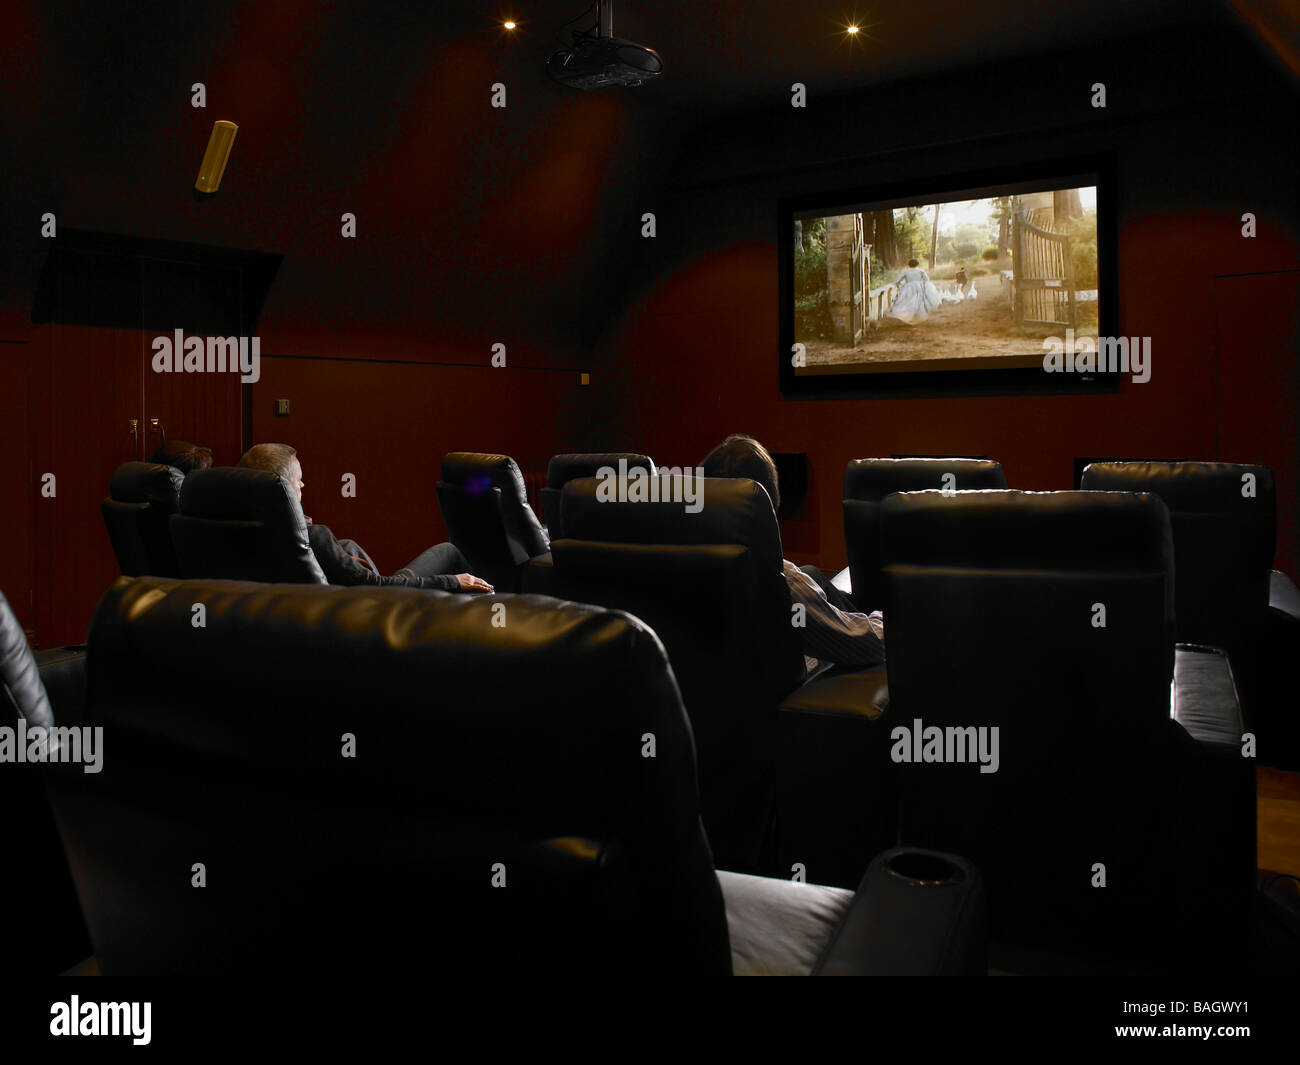 Cinema room - Stock Image